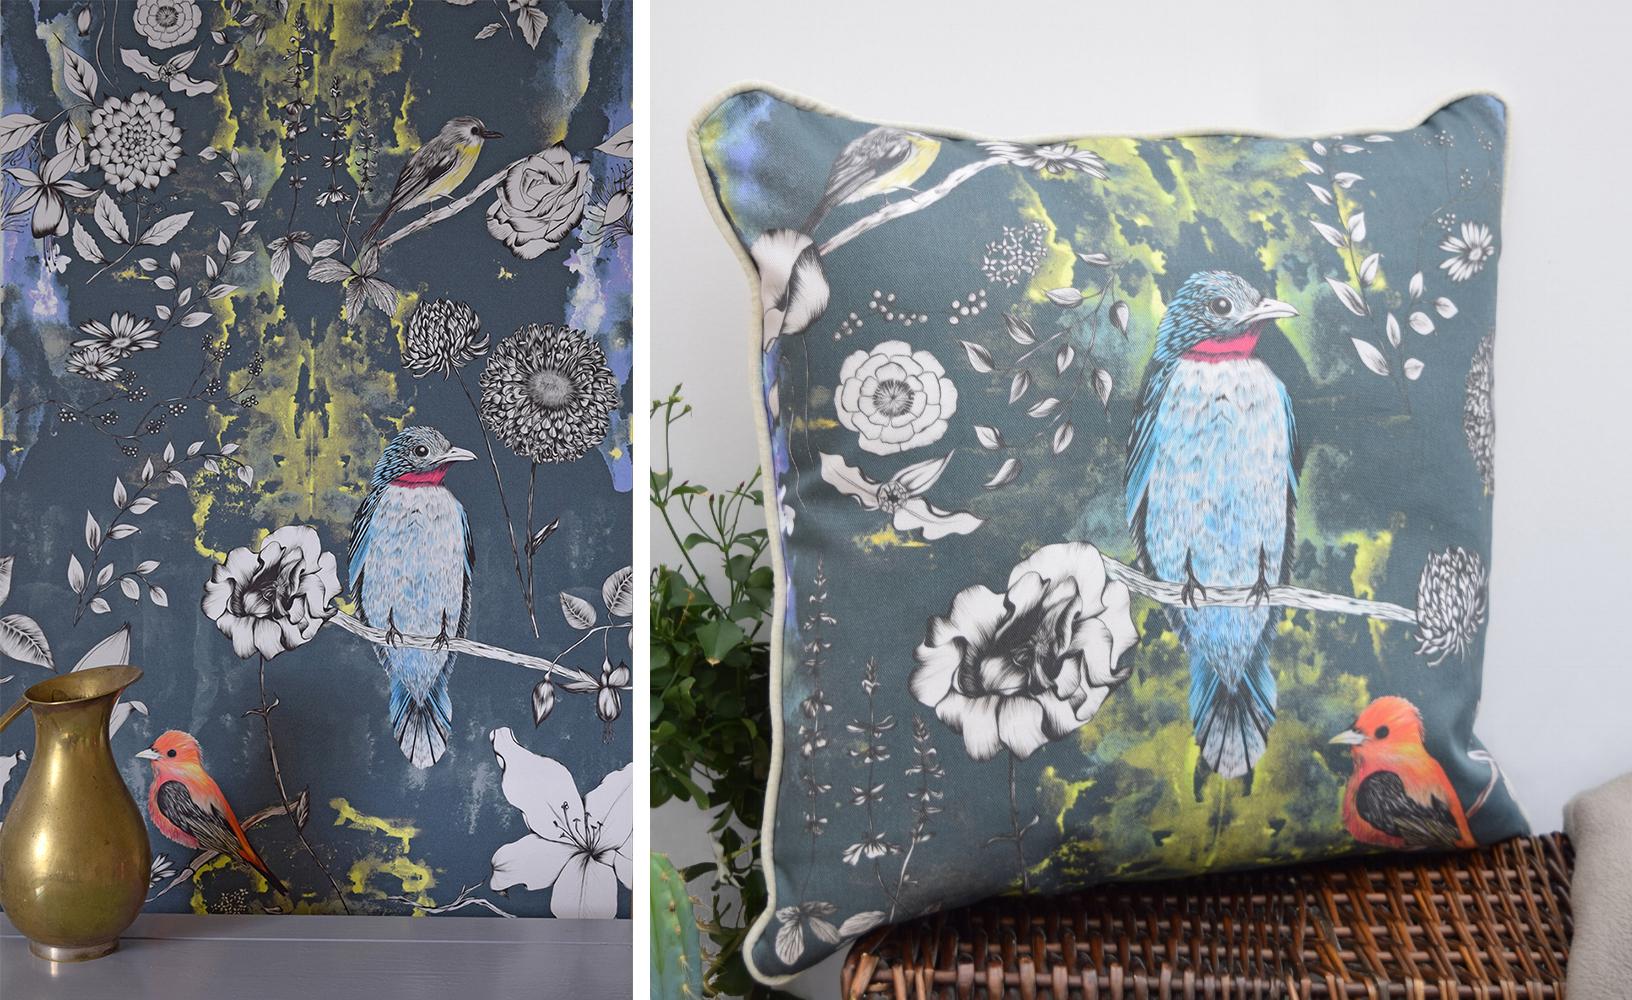 Laura Hart of Surface House, featured designer on Pattern Observer http://patternobserver.com/2016/10/28/featured-designer-laura-hart-of-surface-house/